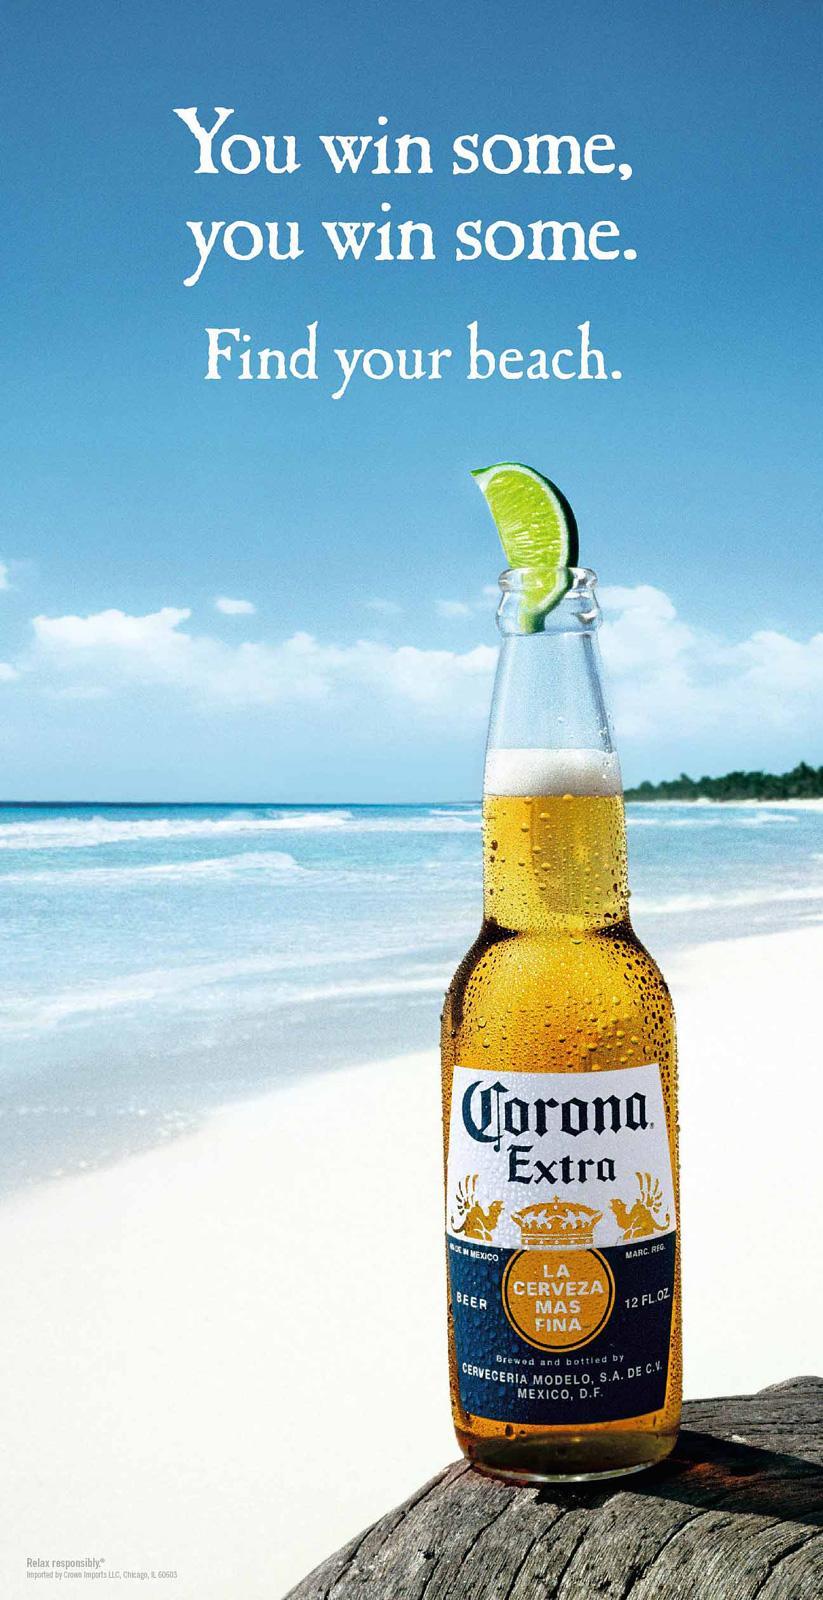 Corona Beer Outdoor Ad -  Win some